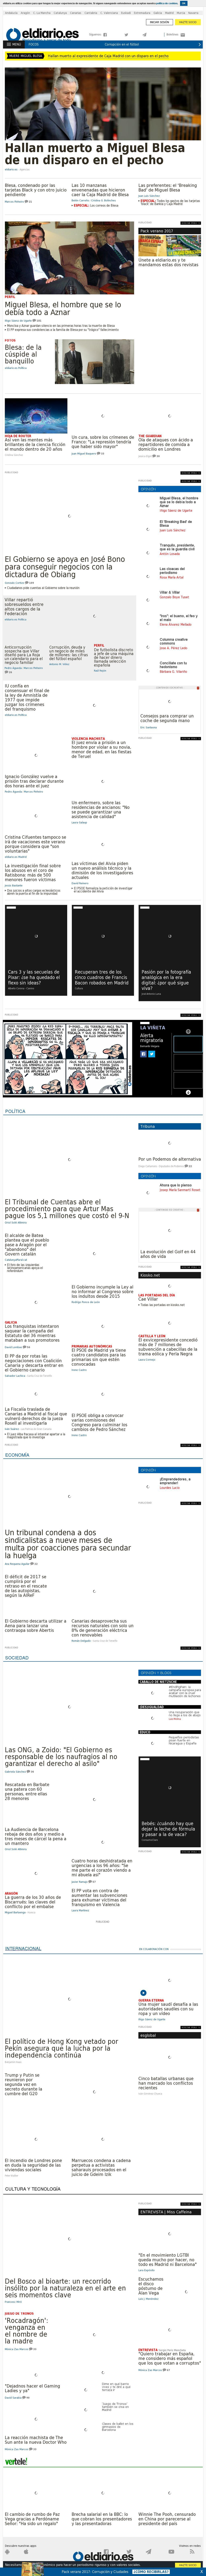 El Diario at Wednesday July 19, 2017, 6:03 p.m. UTC